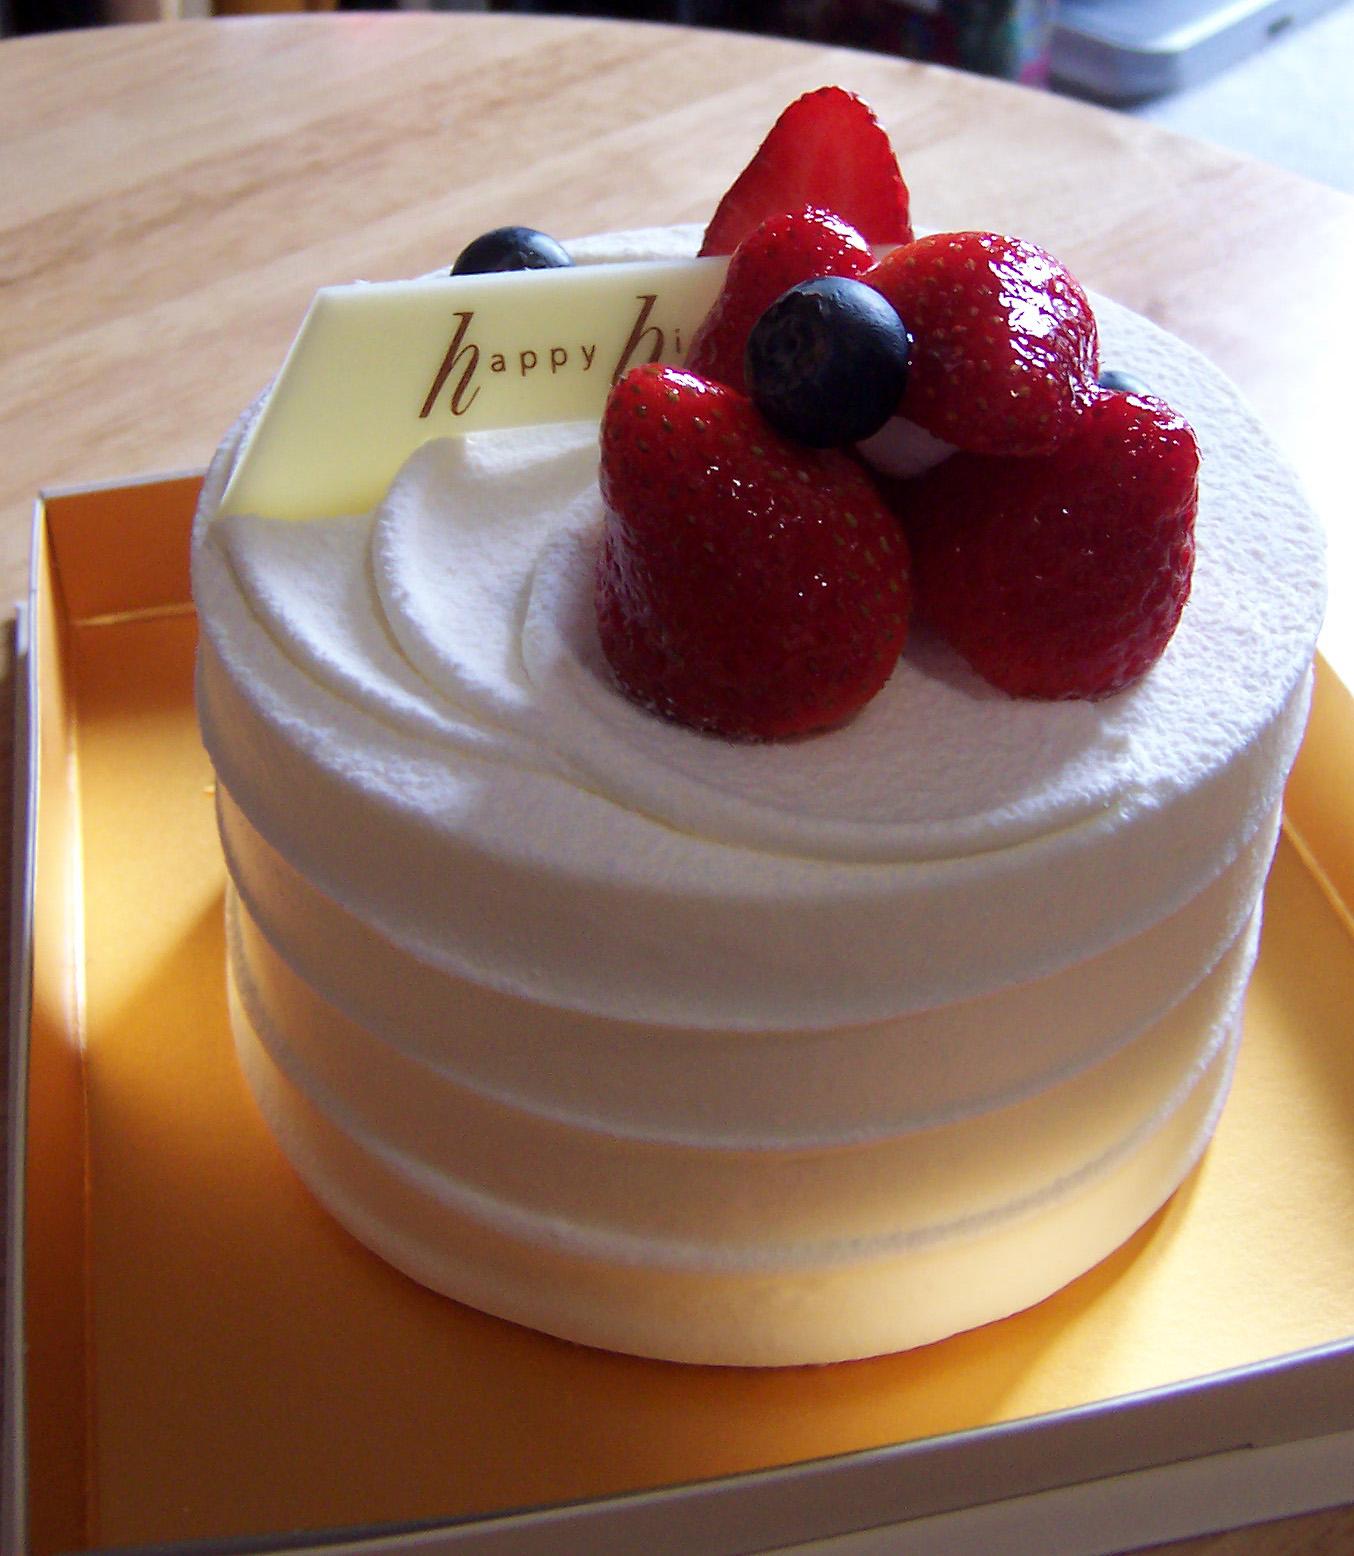 Enjoyable Bestand Birthday Cake 01 Wikipedia Funny Birthday Cards Online Inifofree Goldxyz